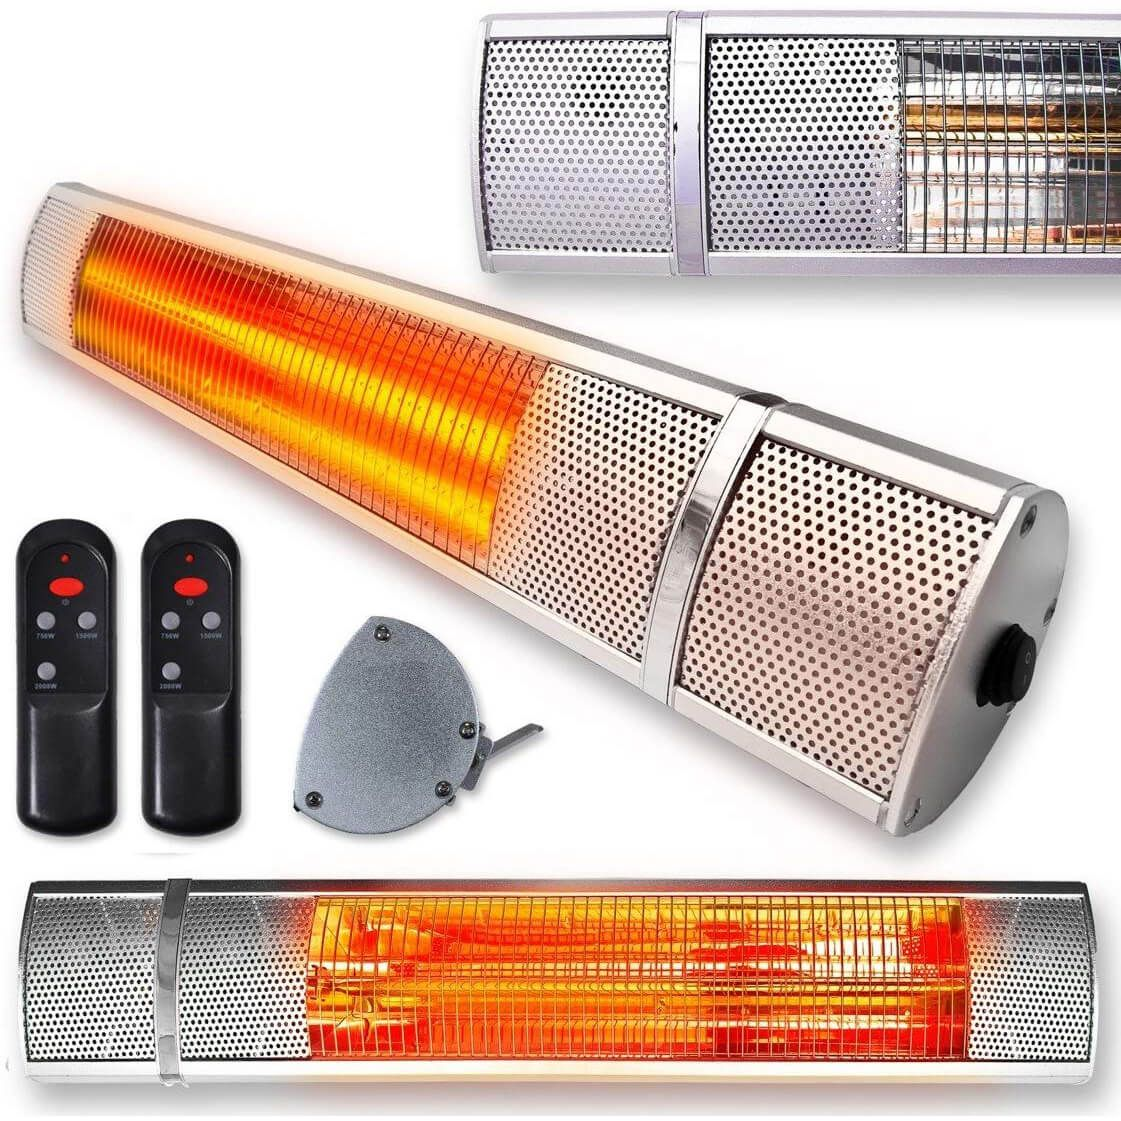 Best Infrared Heaters Infrared heater, Patio heater